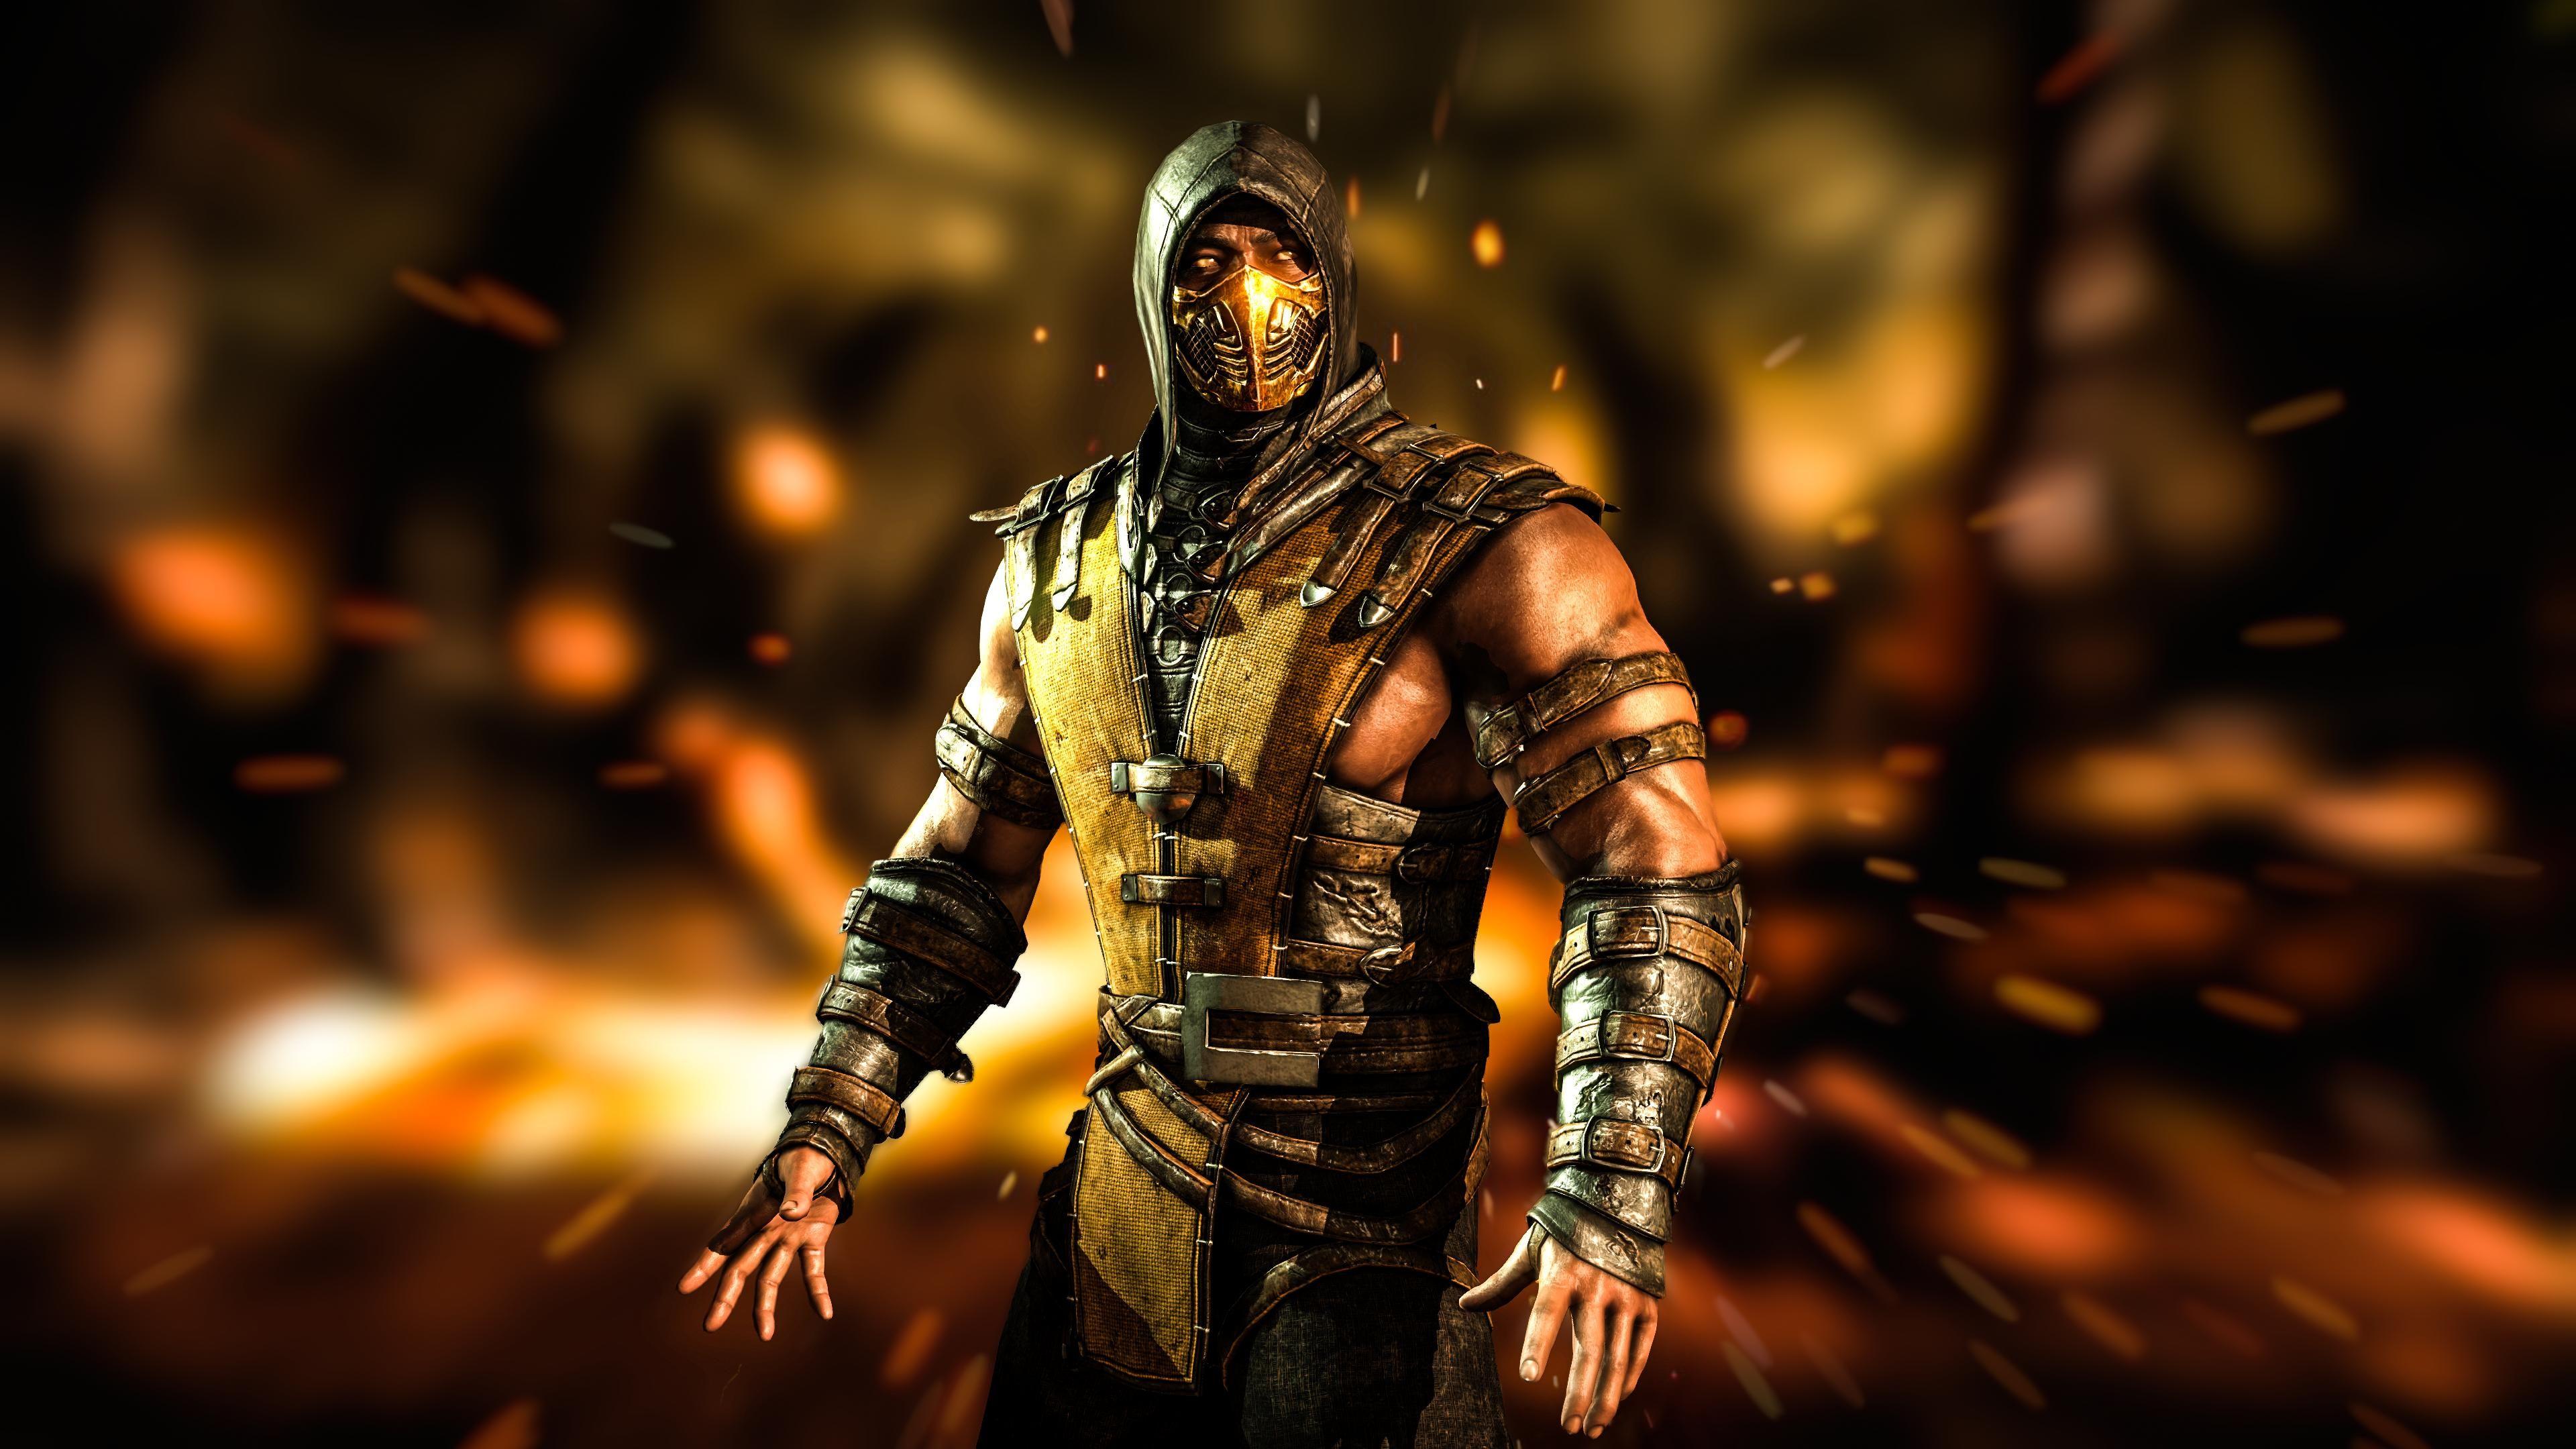 download Mortal Kombat X Scorpion Wallpaper HD Desktop 3840x2160